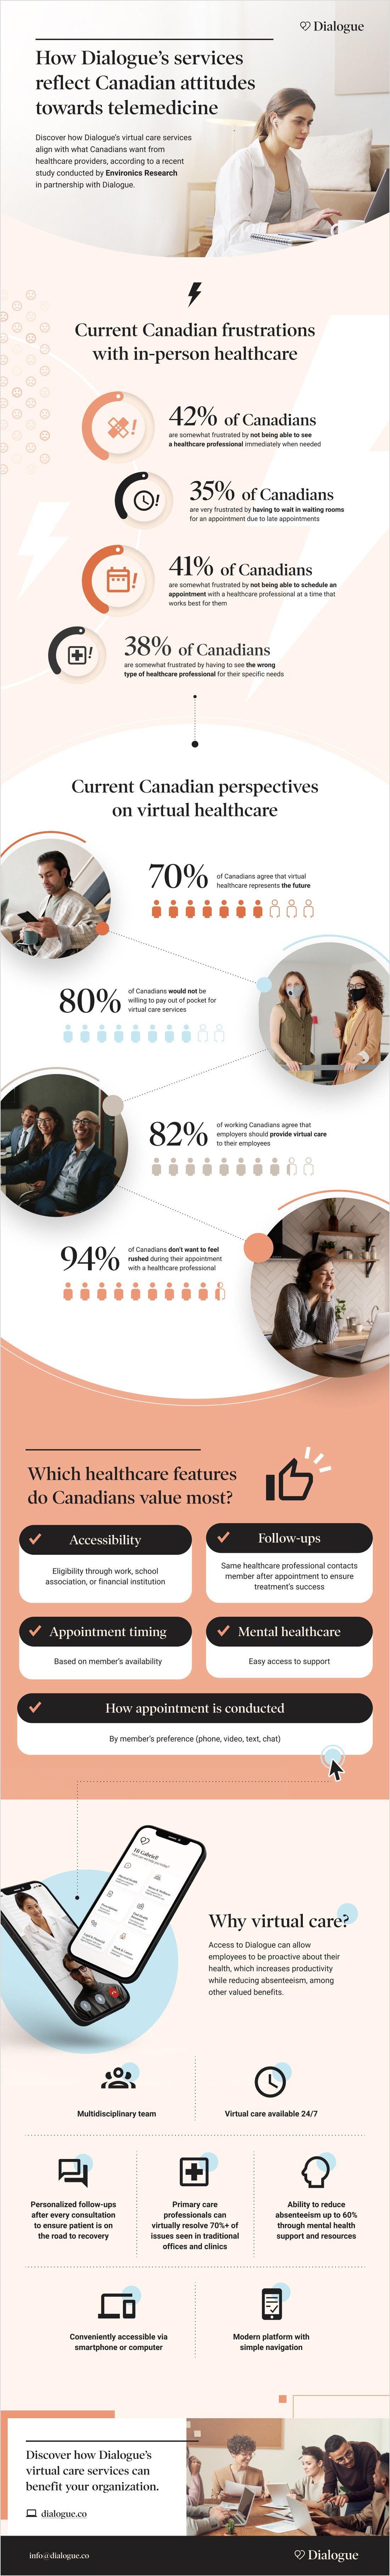 How Dialogue's services reflect Canadian attitudes towards telemedicine